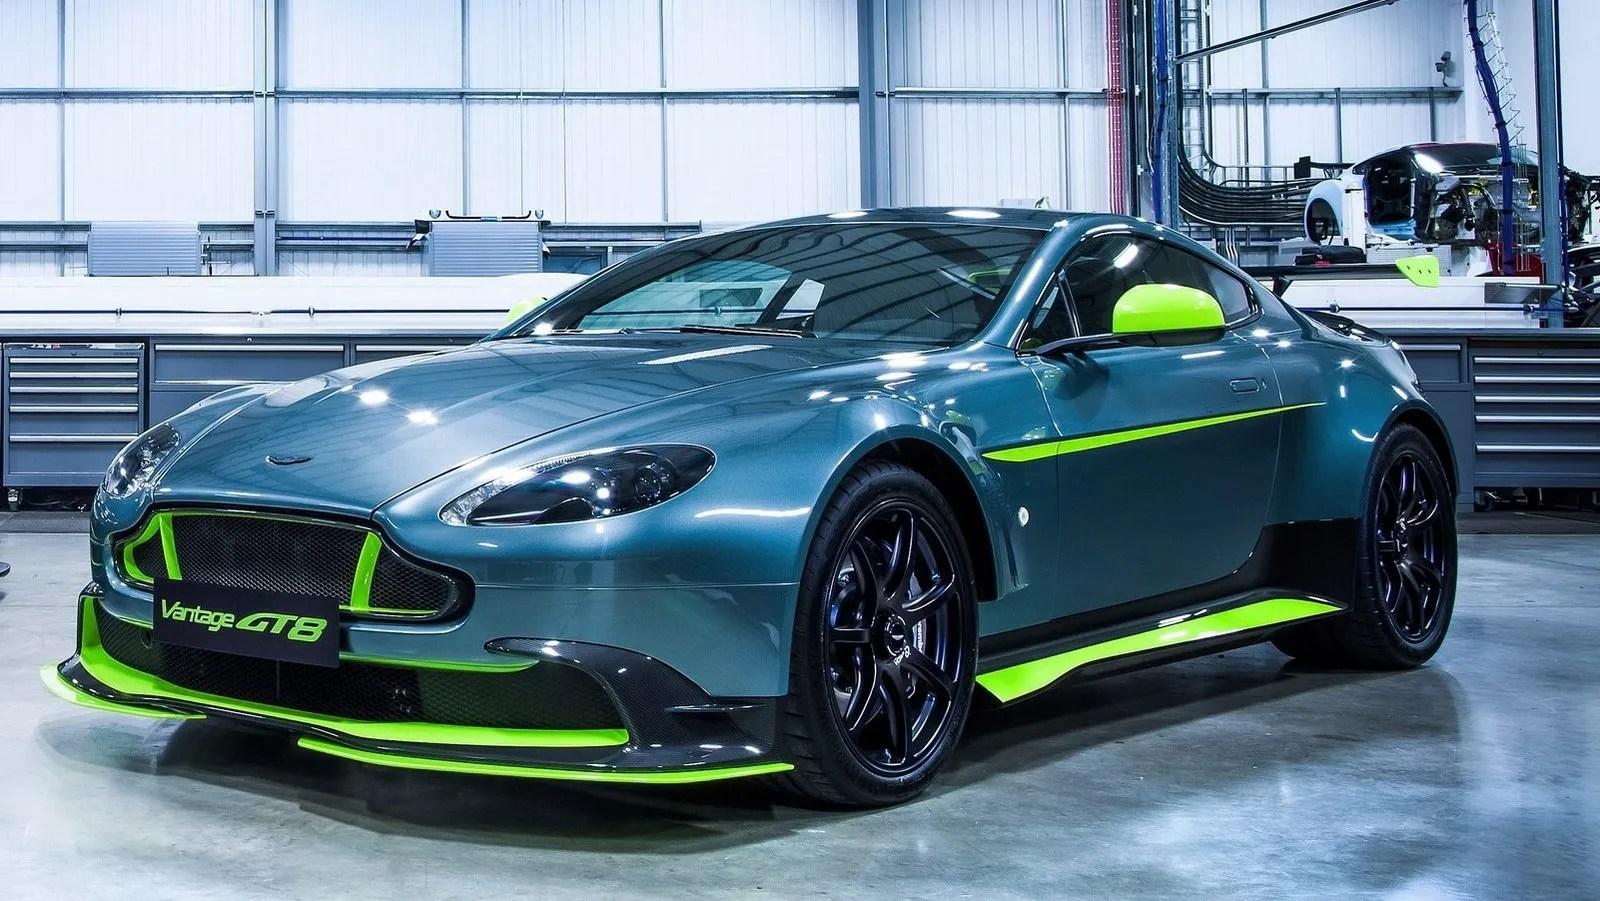 2017 Aston Martin Vantage Gt8 Review  Top Speed